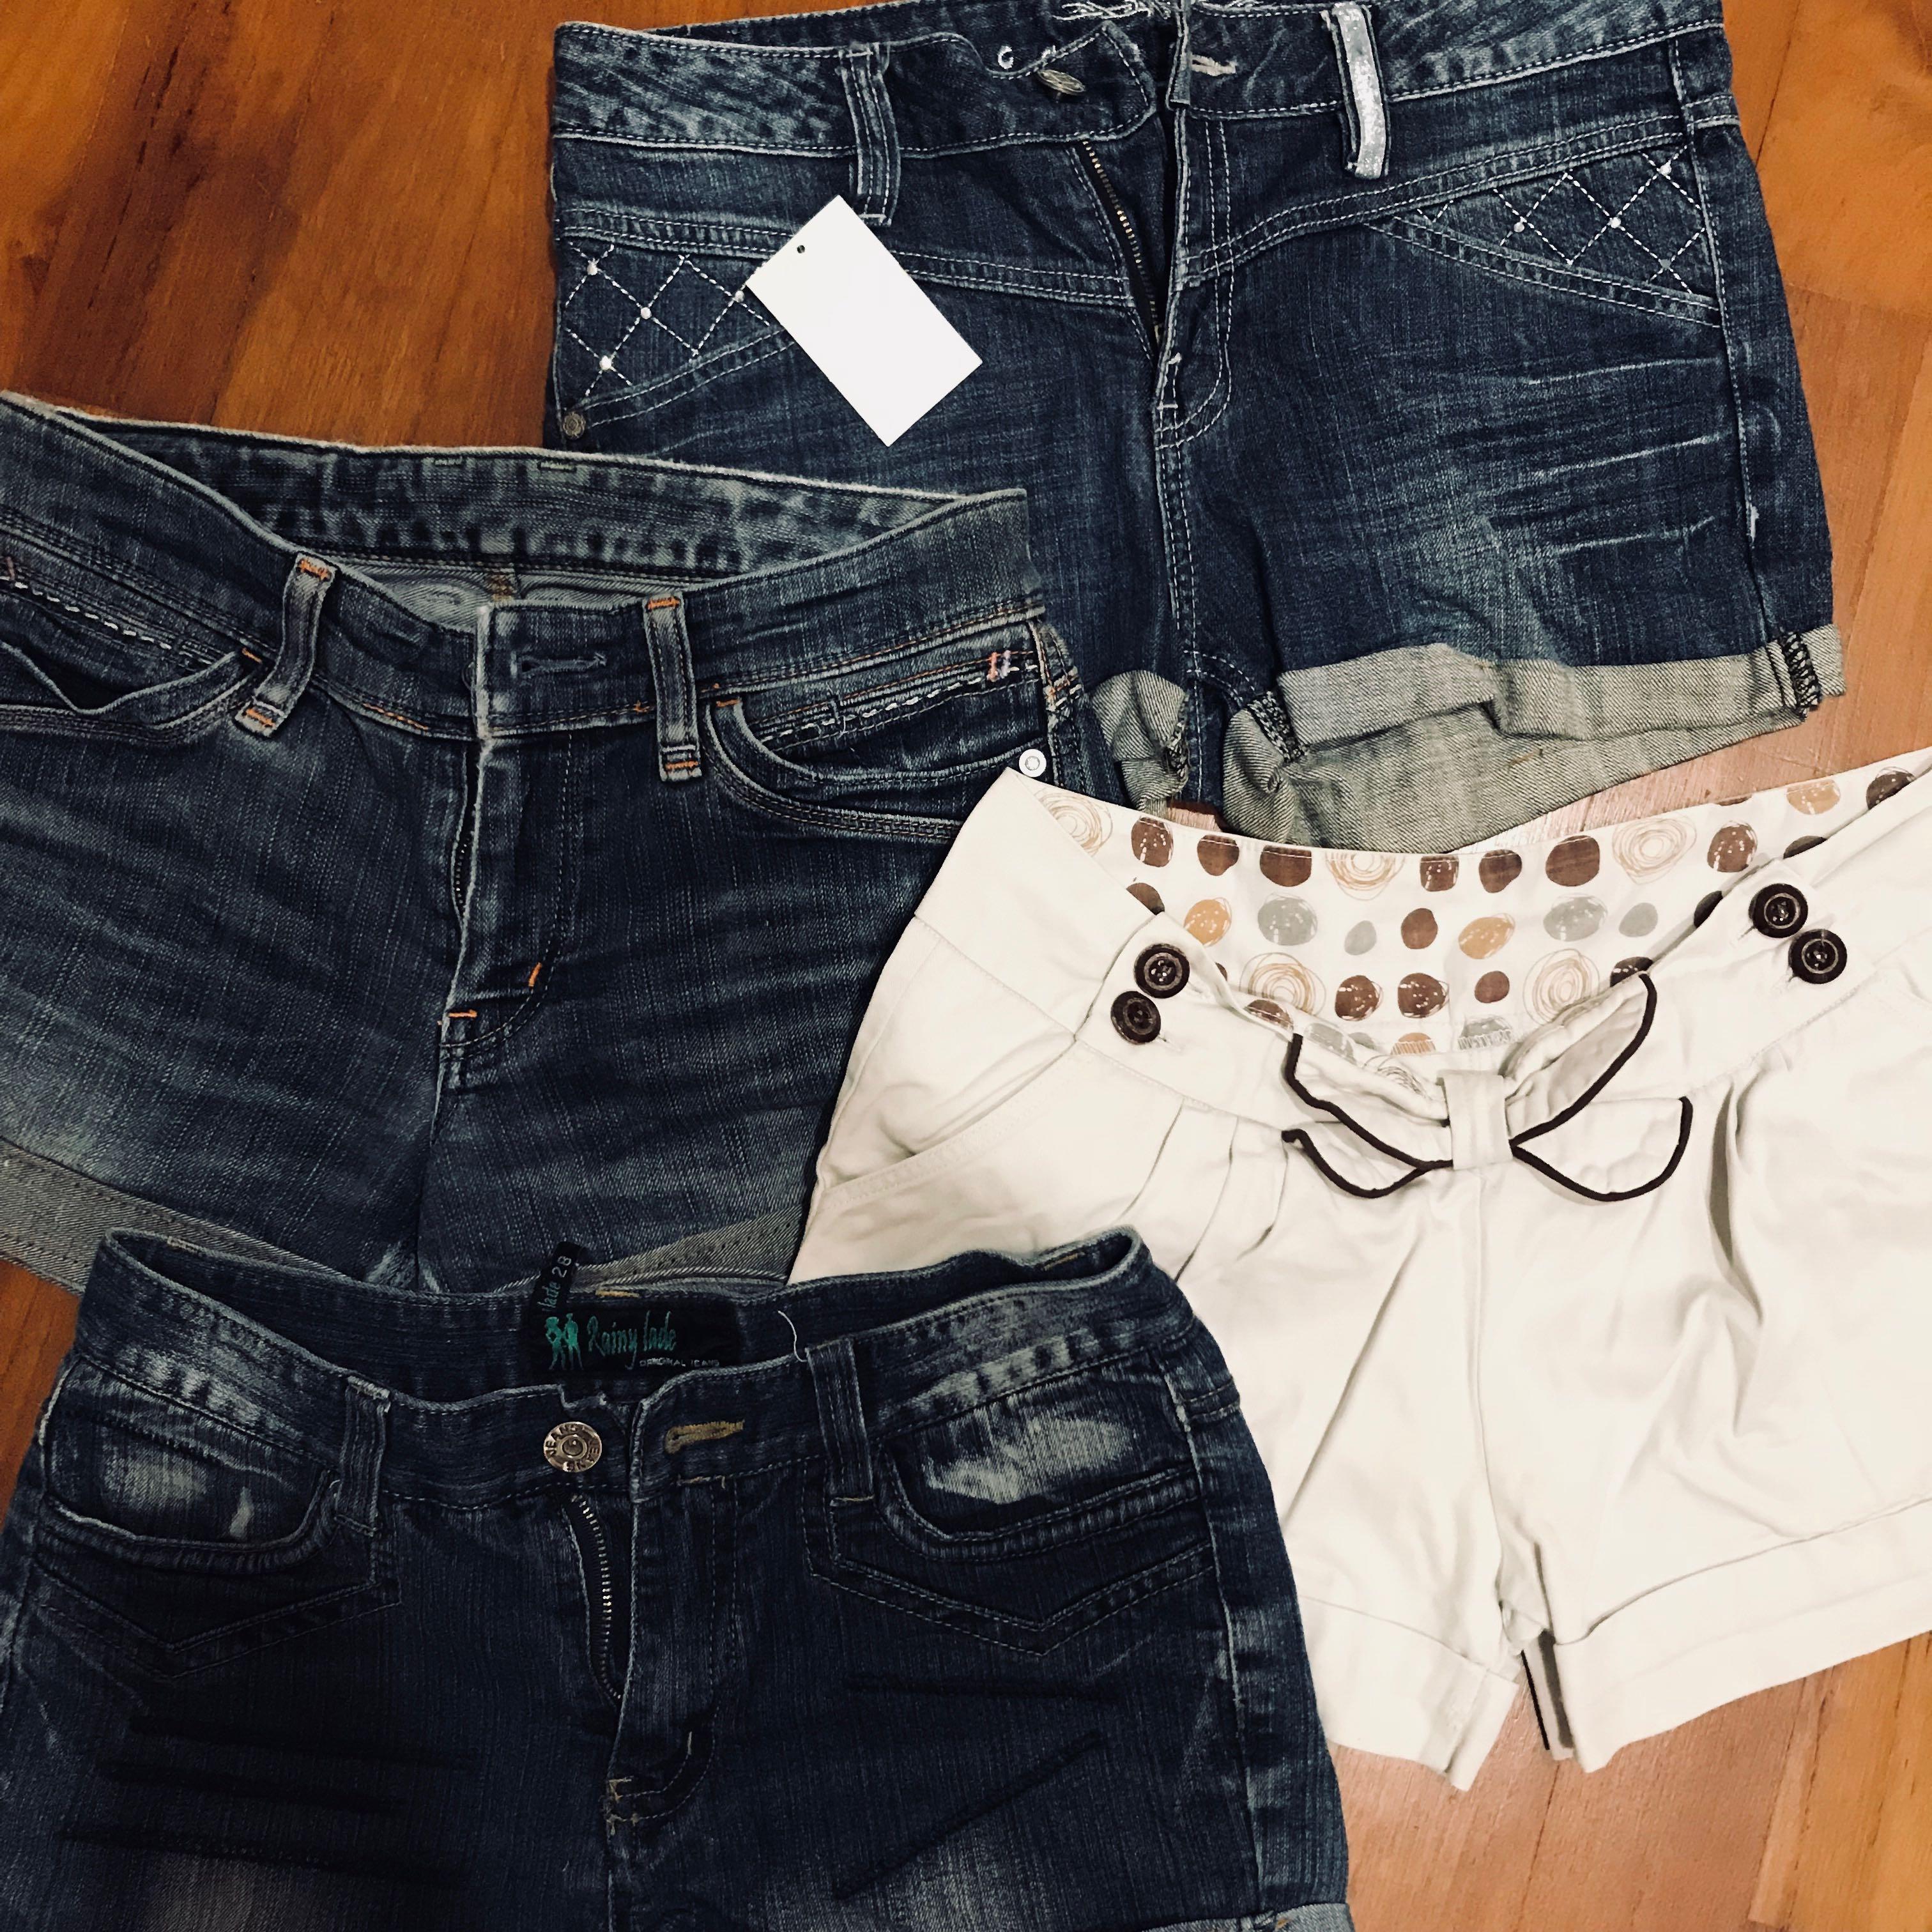 7aed6ac615 basic denim shorts, Women's Fashion, Clothes, Pants, Jeans & Shorts ...